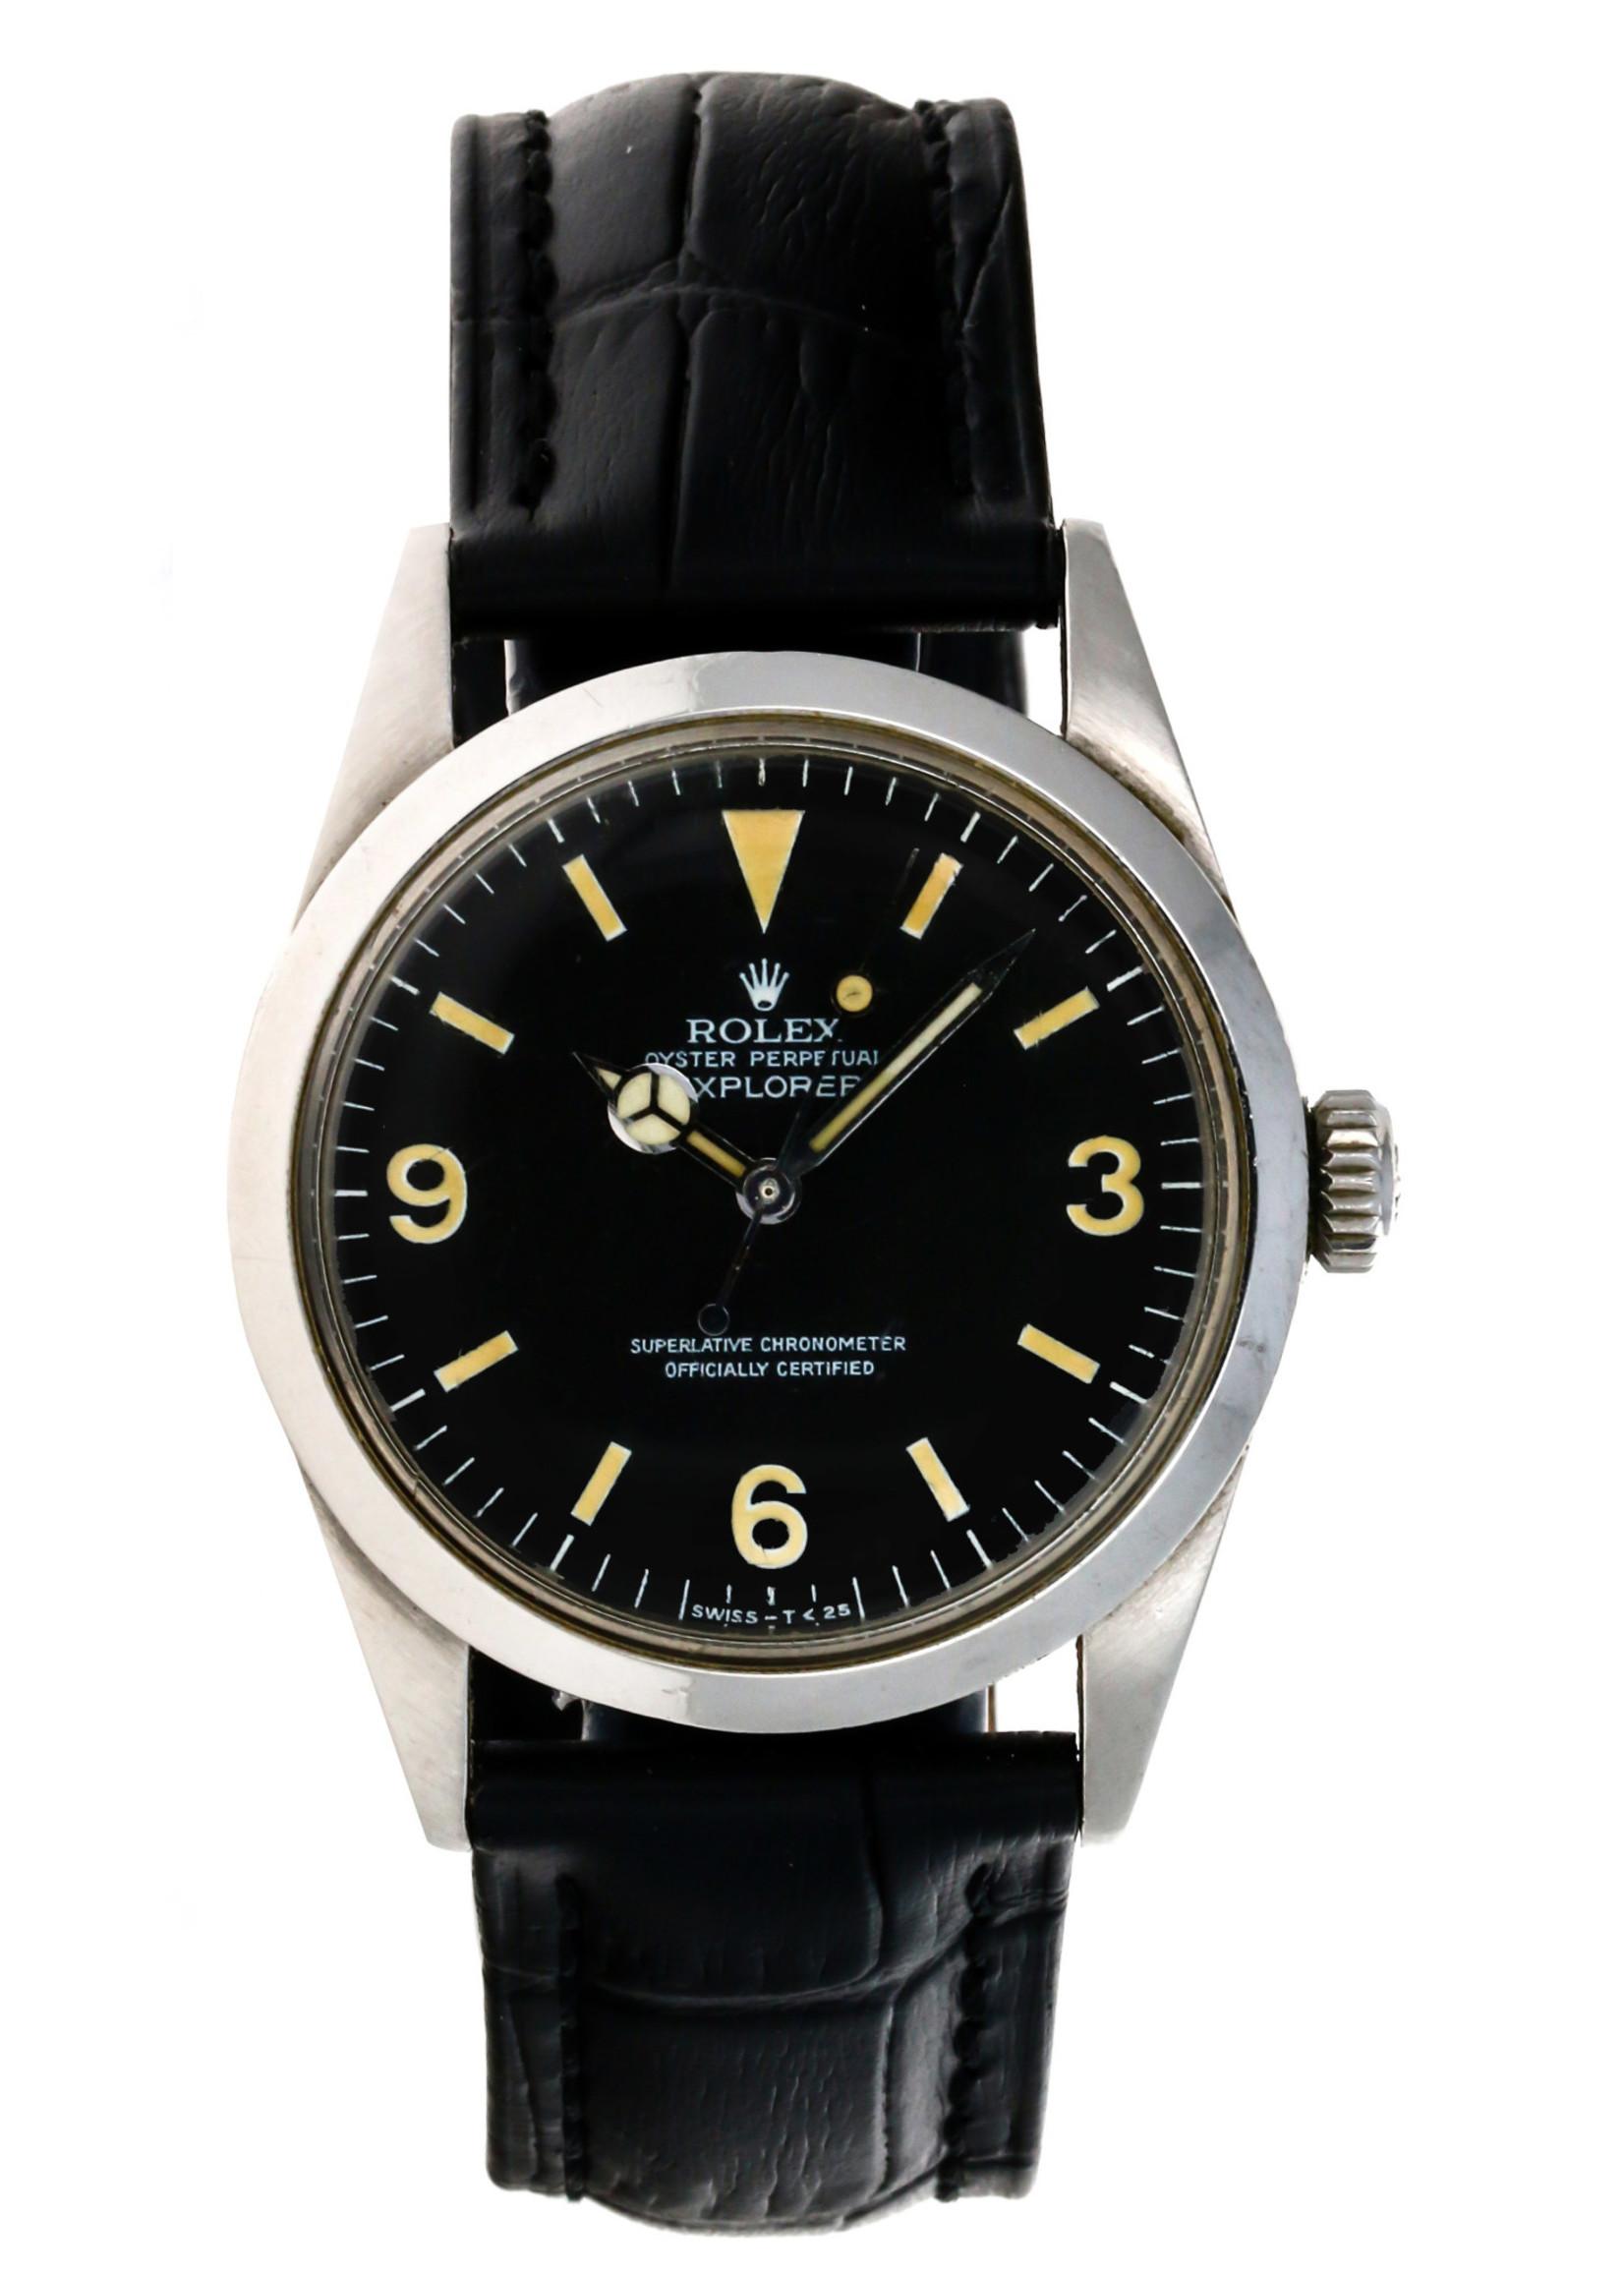 Rolex Watches ROLEX EXPLORER (1972) SERVICE PAPERS #1016